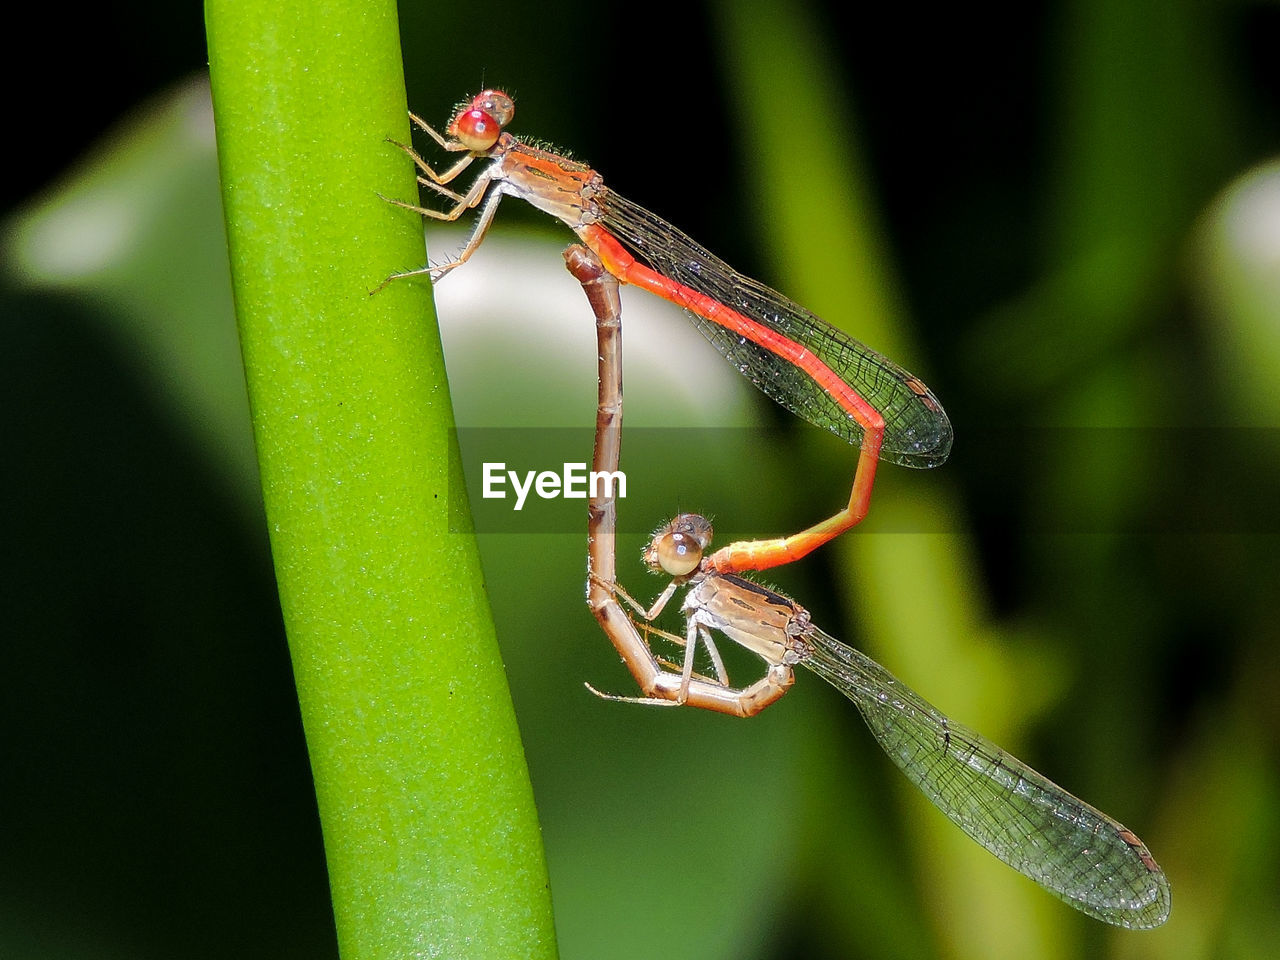 CLOSE-UP OF SPIDER ON STEM